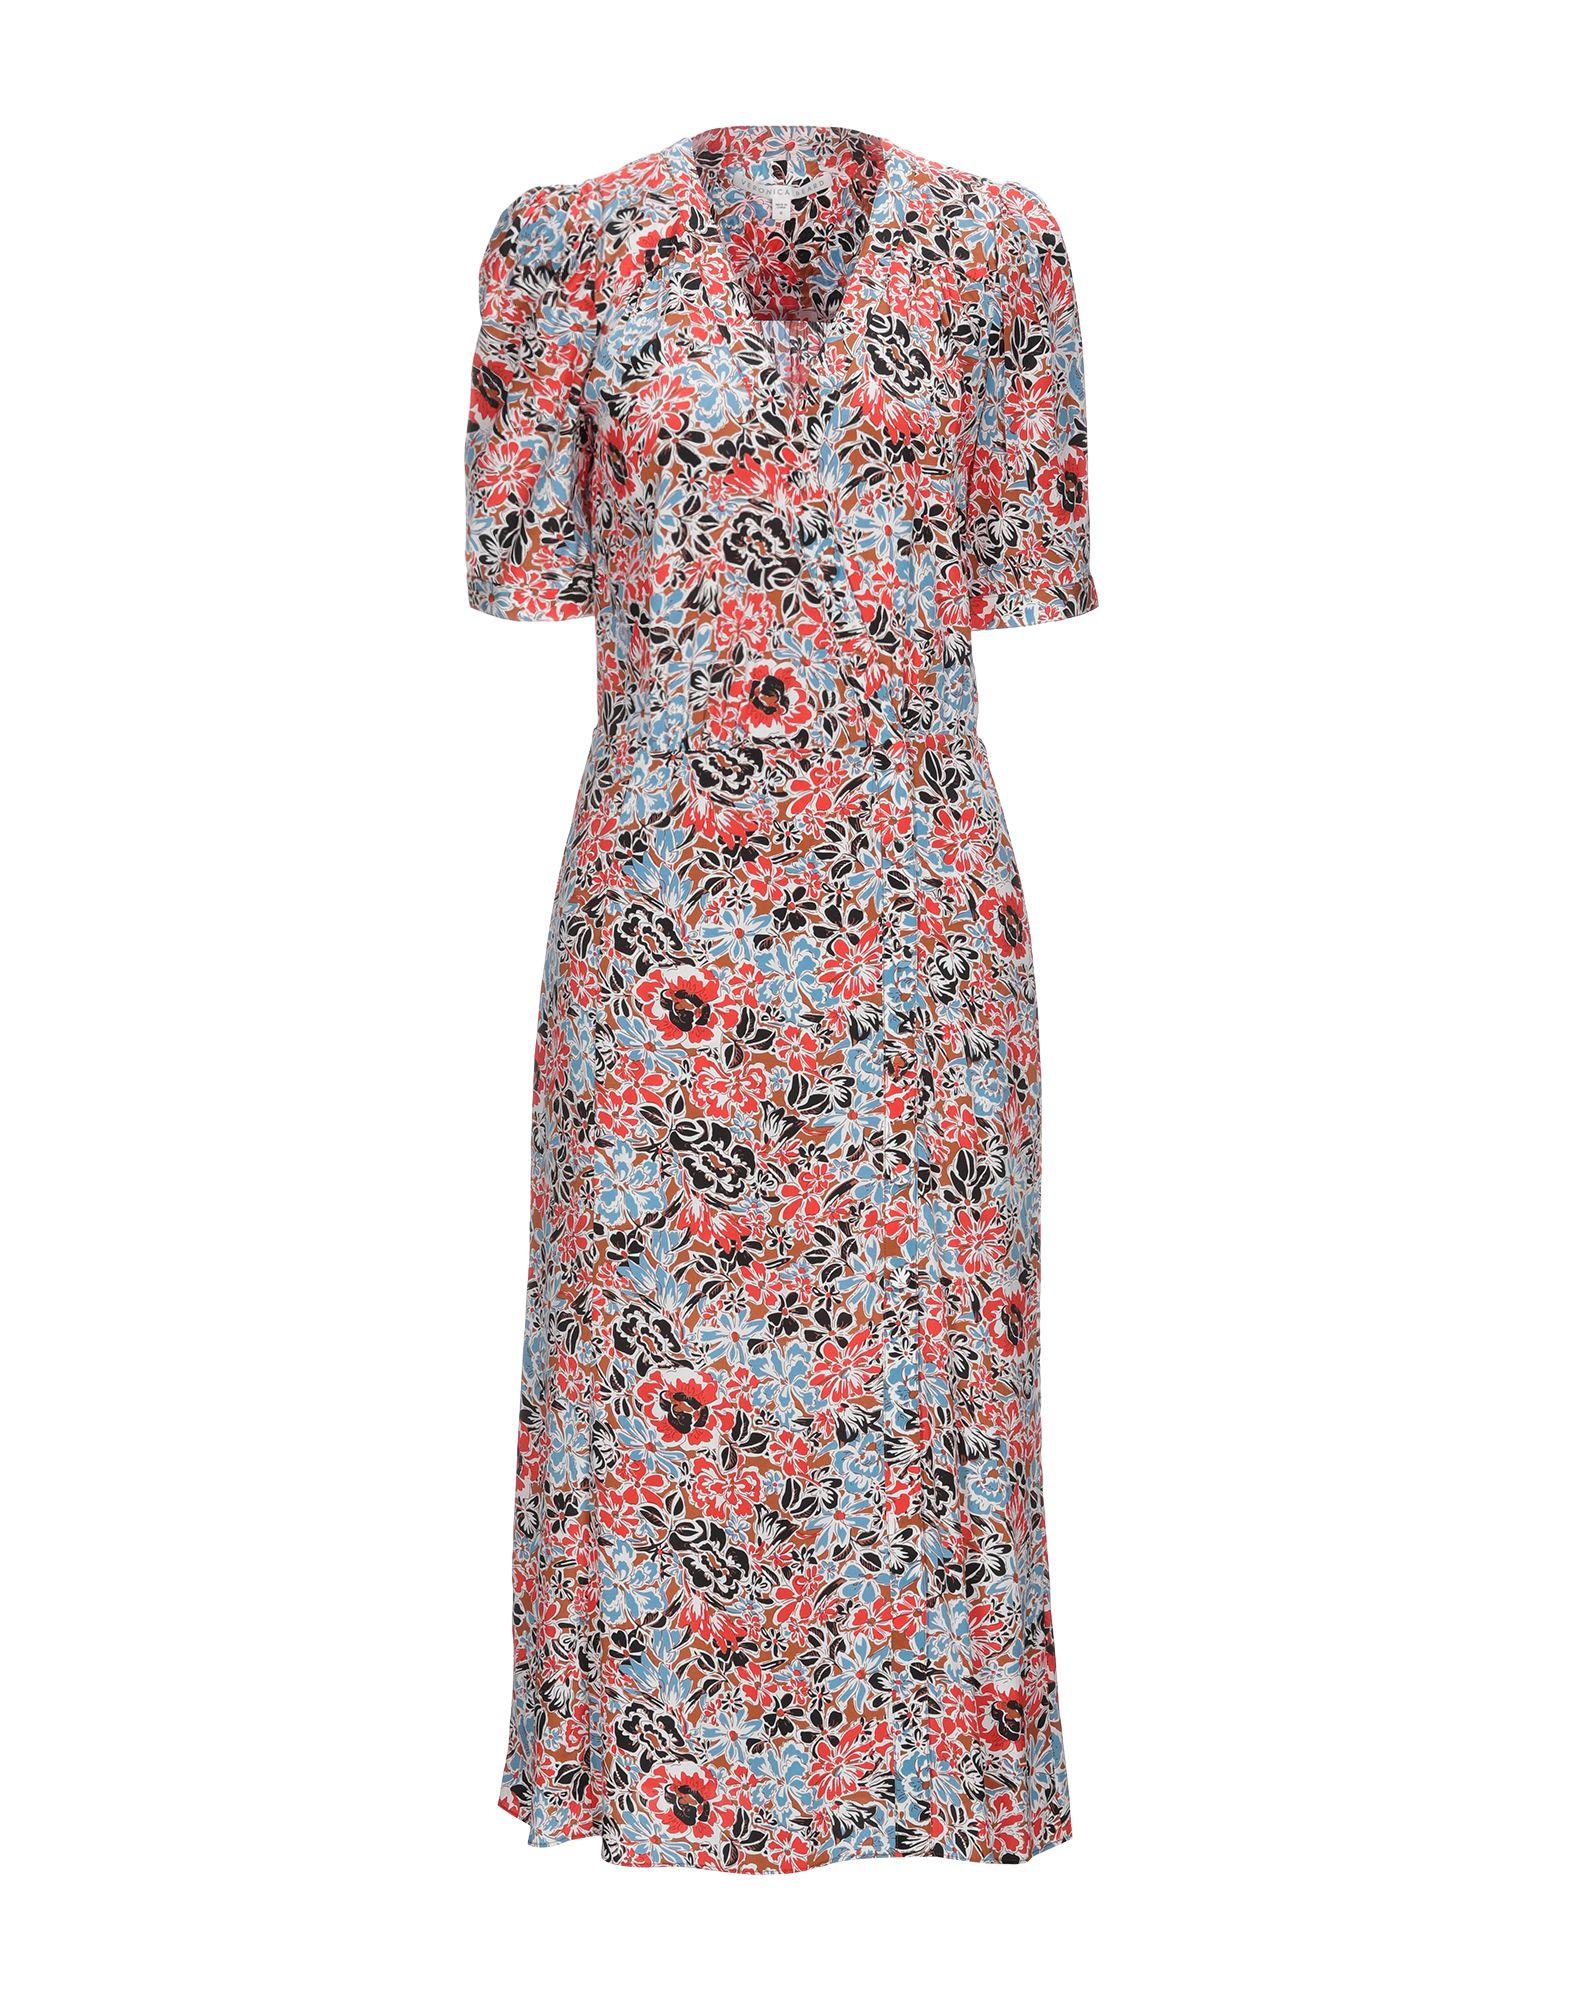 VERONICA BEARD 3/4 length dresses. crepe, no appliqués, floral design, v-neck, short sleeves, no pockets, front closure, unlined, stretch, button closing. 91% Silk, 9% Elastane